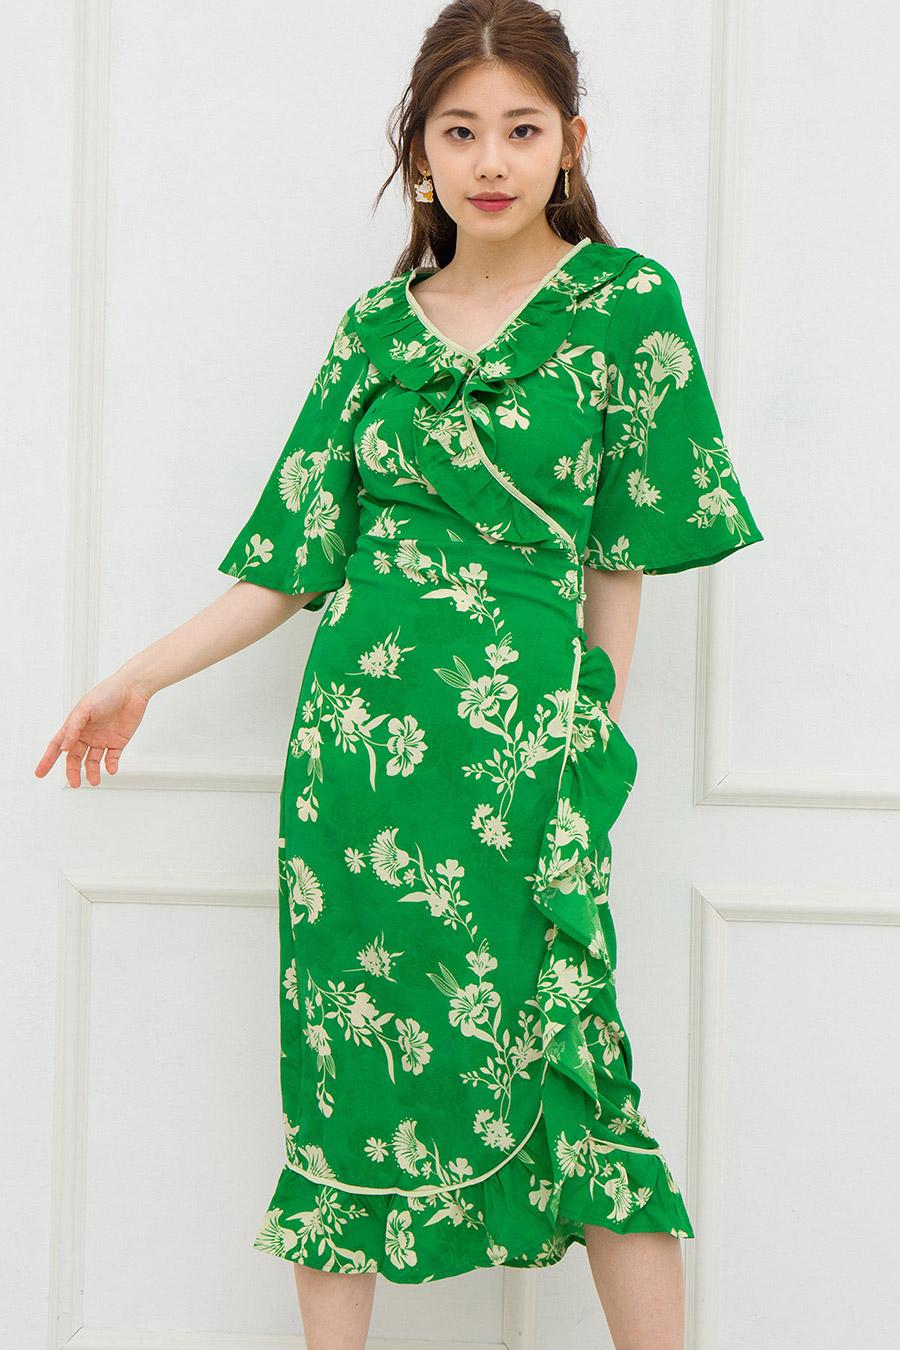 SARAH DRESS - EMERALD FLEUR